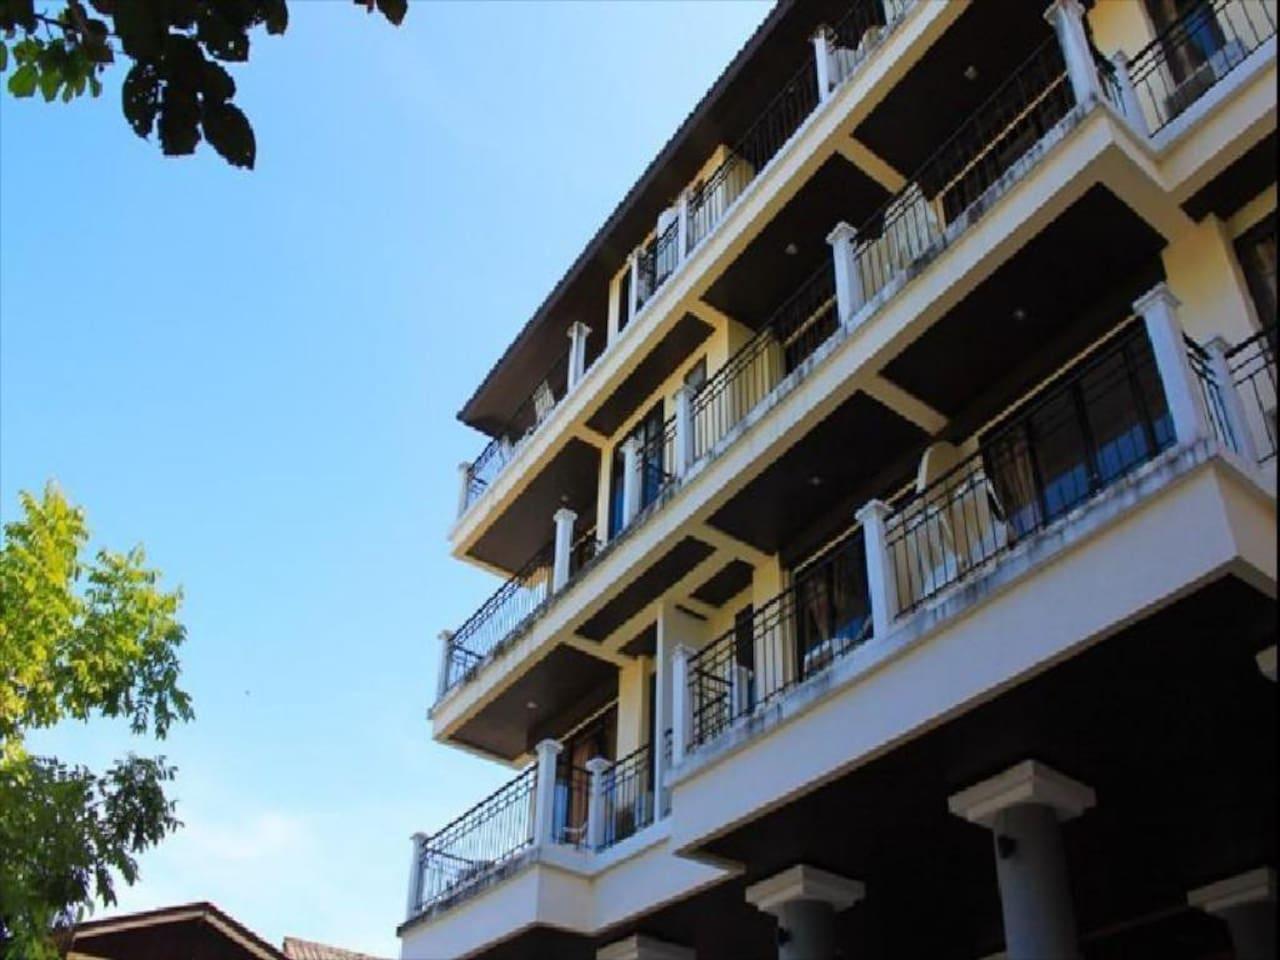 Double Room Deluxe with balcony 5 1 ห้องนอน 1 ห้องน้ำส่วนตัว ขนาด 30 ตร.ม. – หาดเฉวง